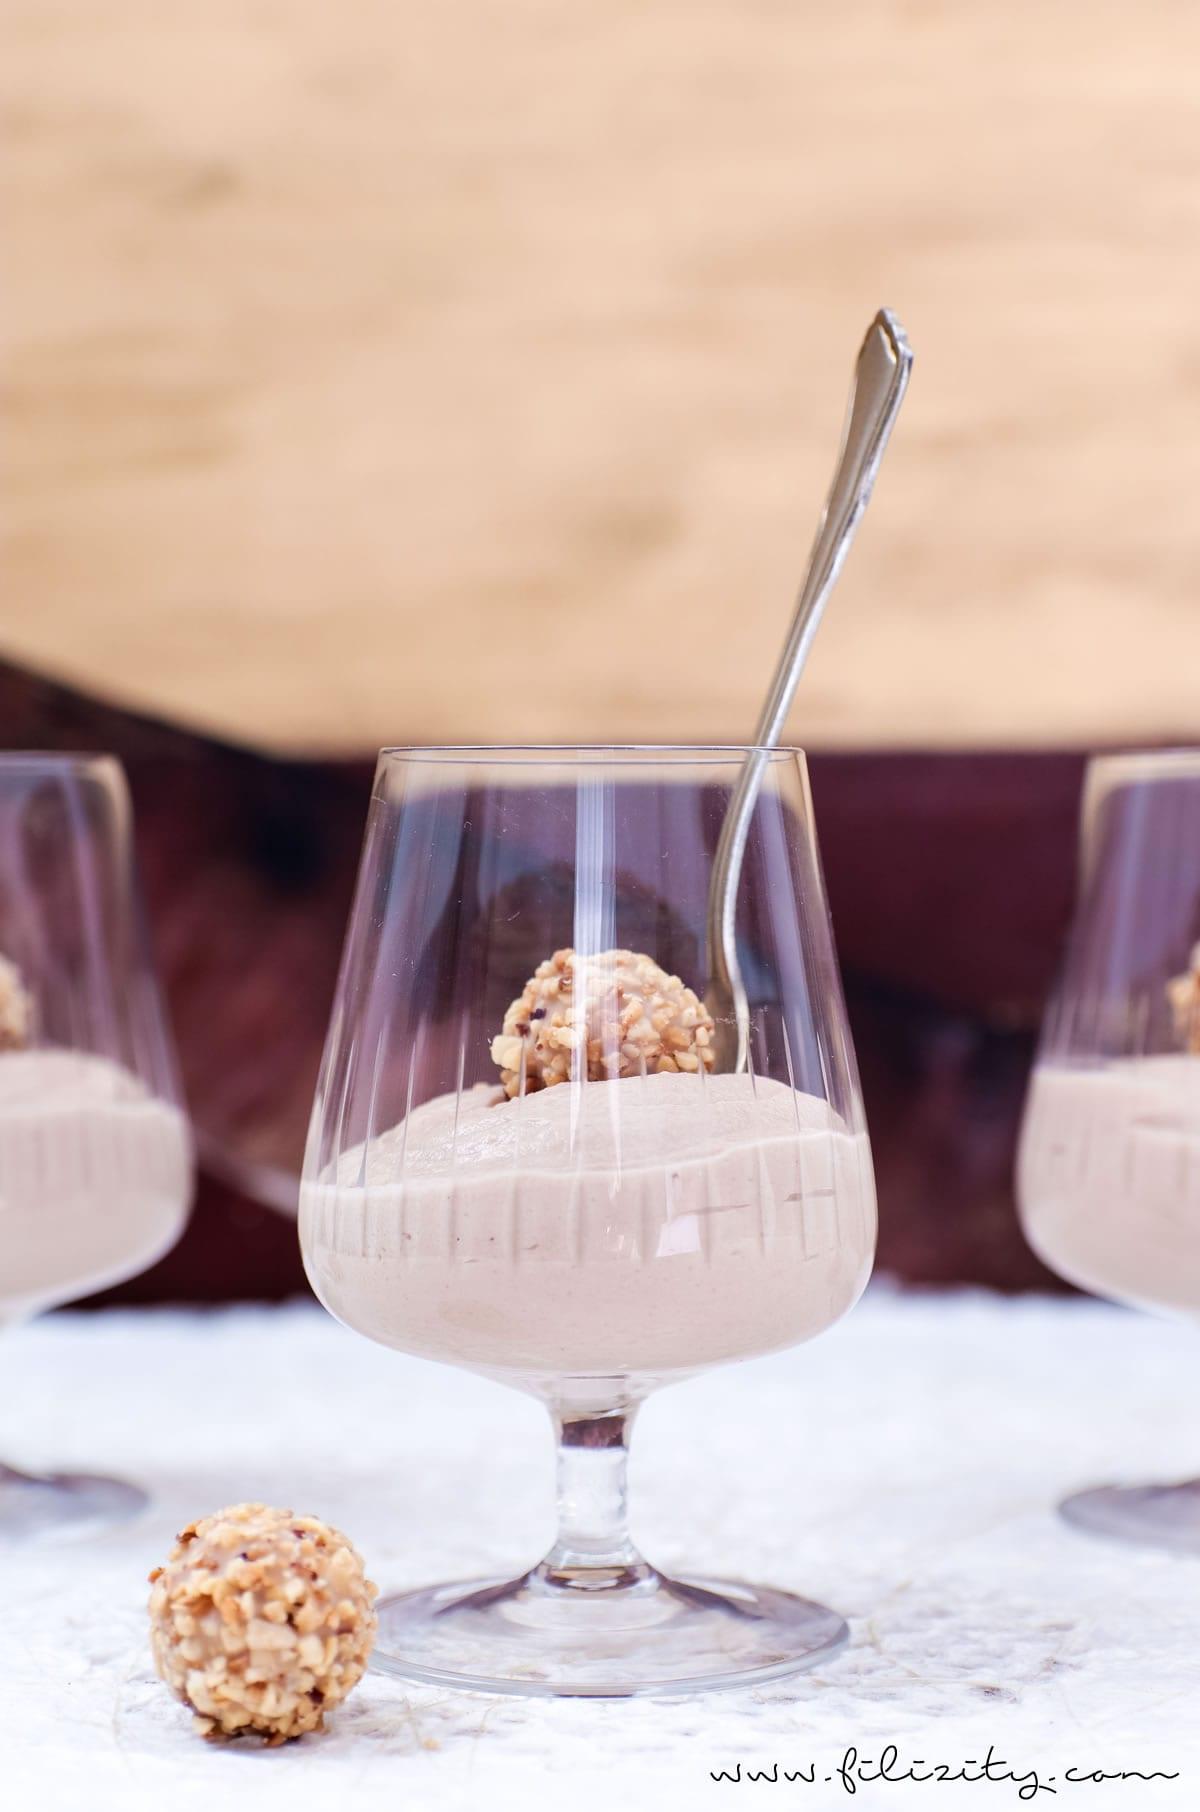 Schnelles Dessert-Rezept: Schoko-Nougat-Mousse mit Quark | Filizity.com | Food-Blog aus dem Rheinland #dessert #nougat